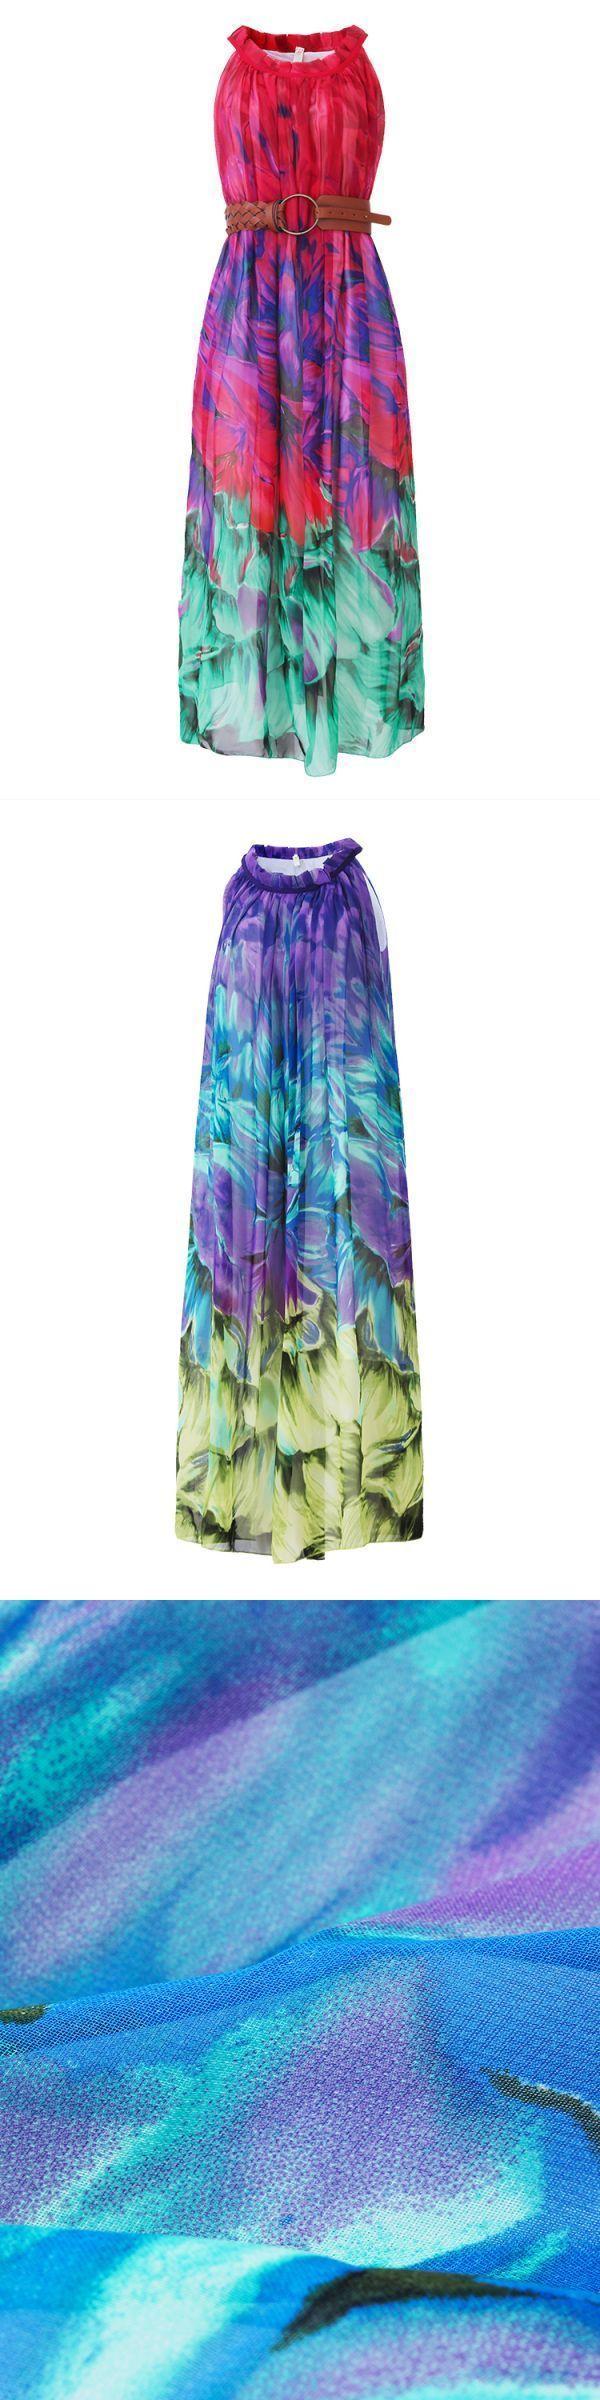 Maxi dress size 8 petite bohemian women sleeveless halter printed summer beach chiffon maxi dresses #maxi #dresses #utah #maxi #dresses #zara #india #v #neck #maxi #dresses #v #neck #maxi #dresses #uk